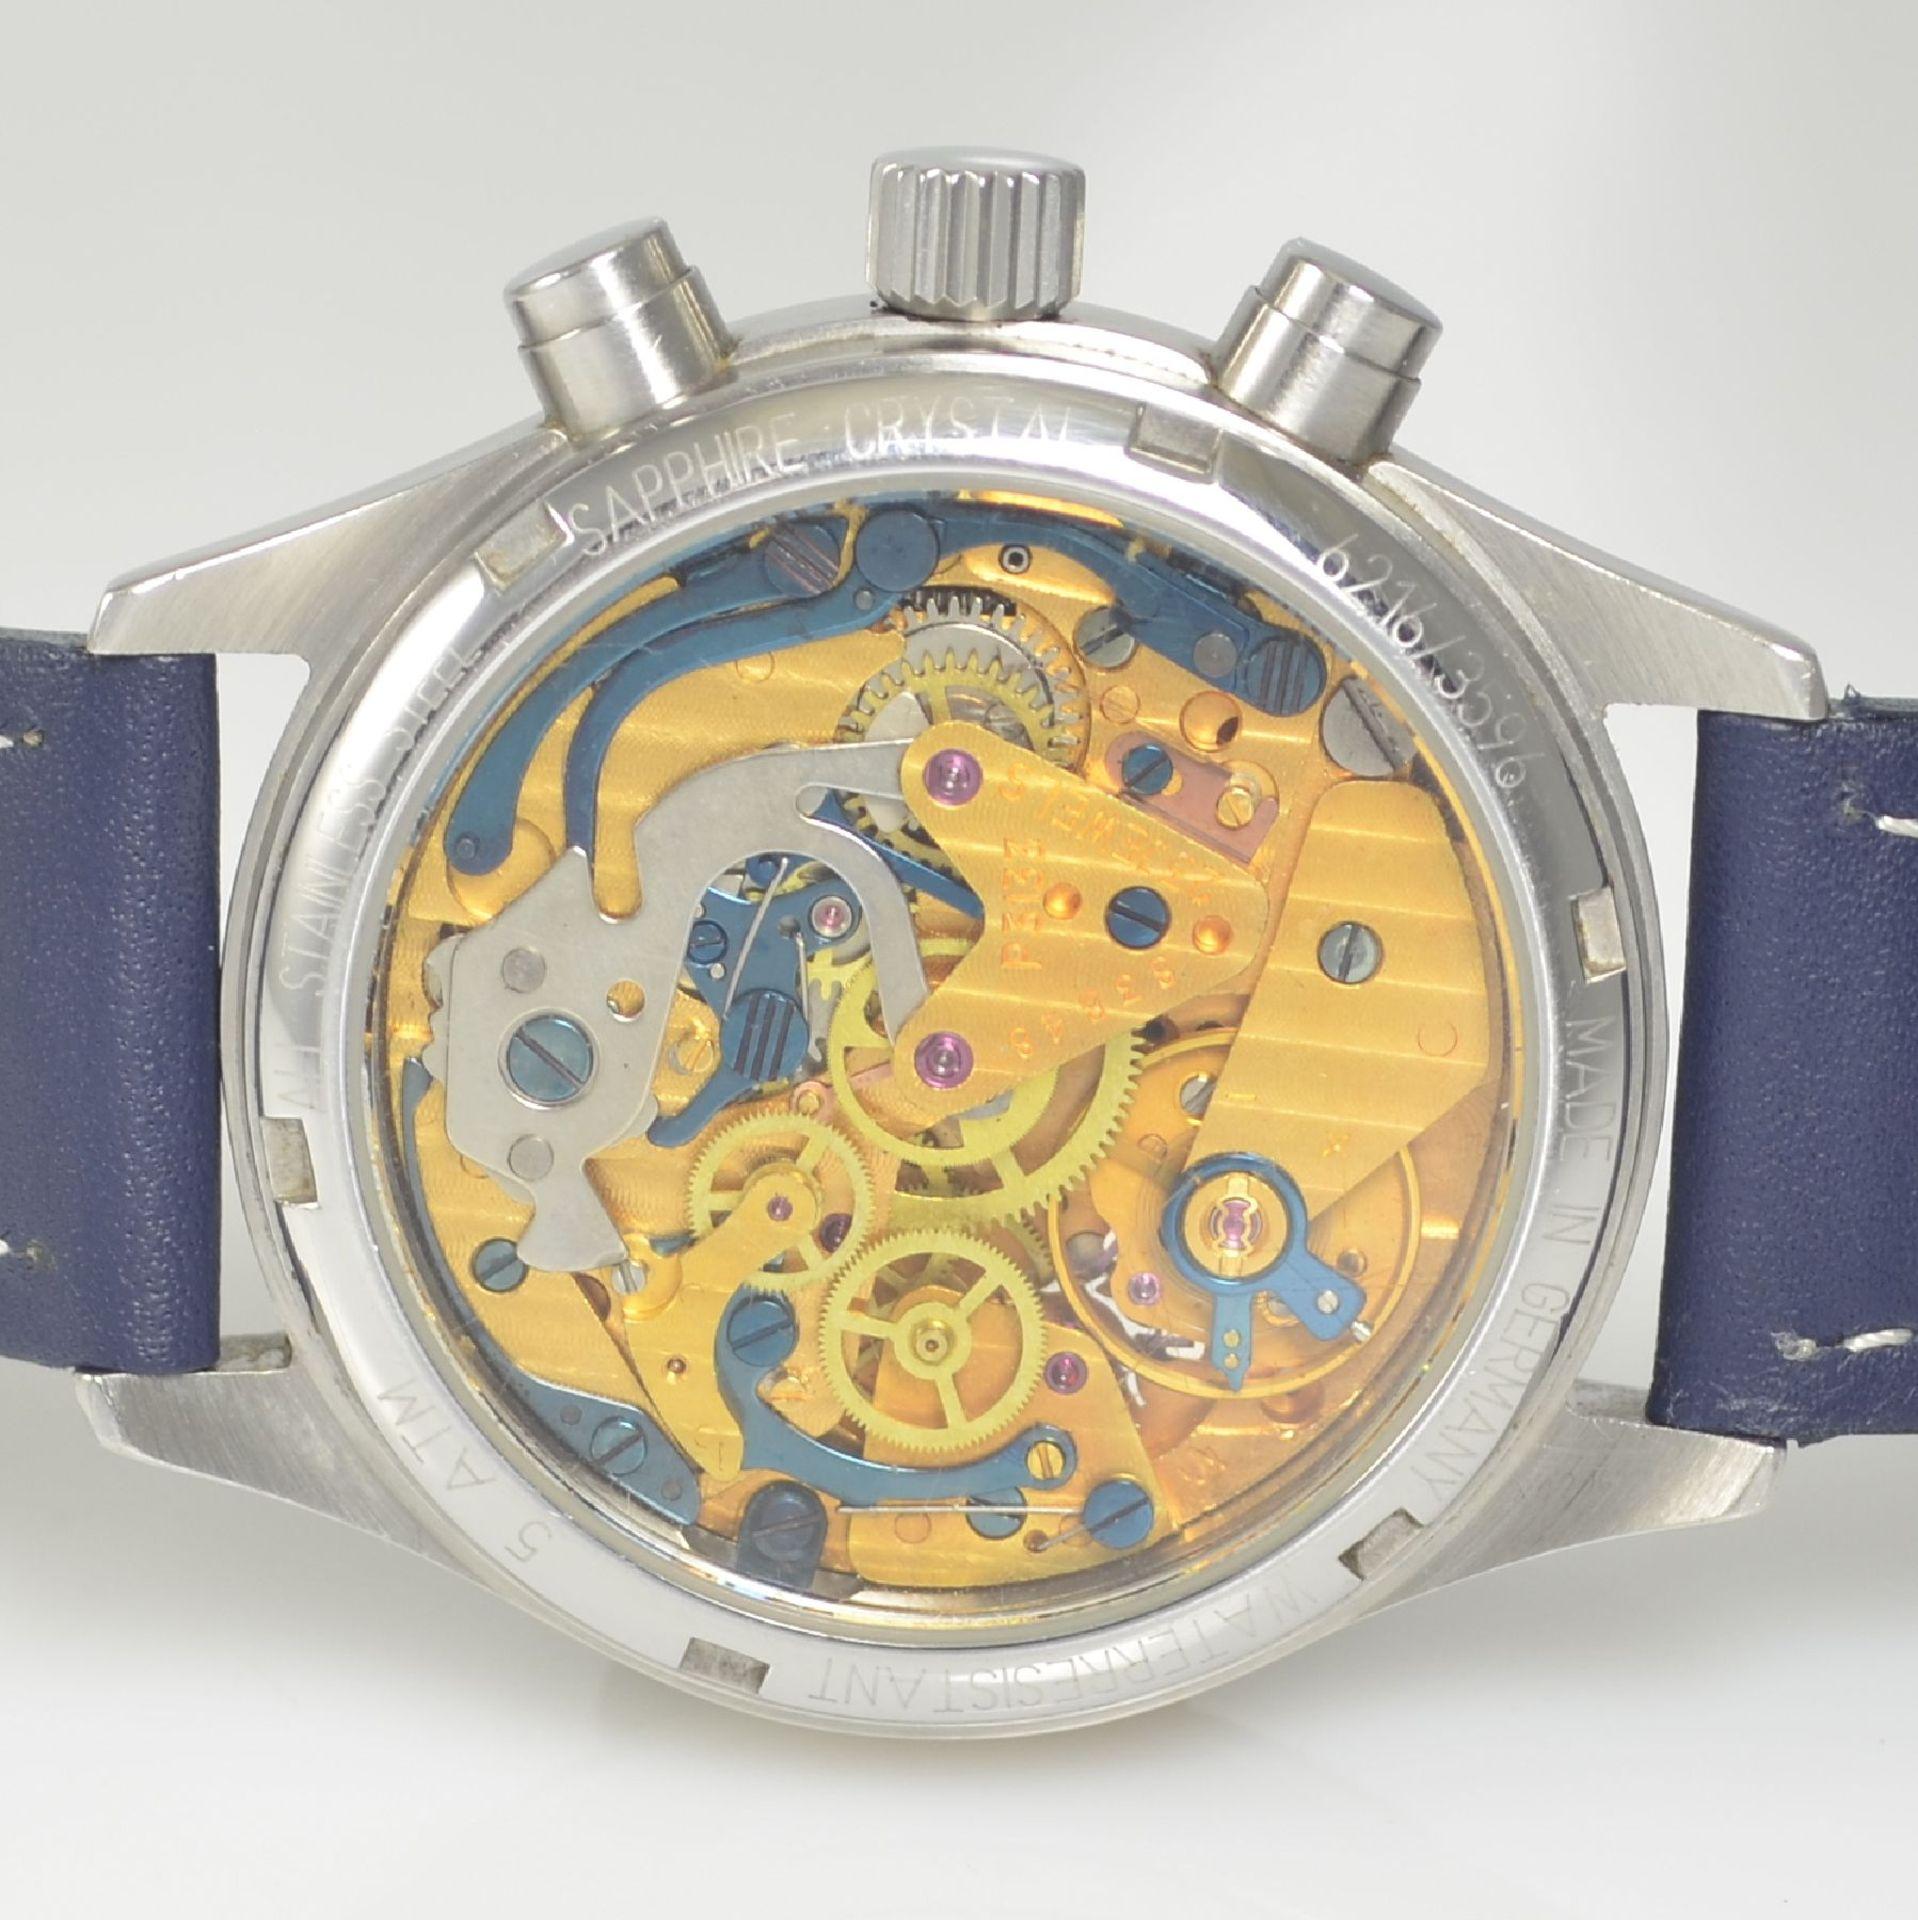 JUNKERS Herrenarmbanduhr mit Chronograph, Deutschland um 2008, Handaufzug, beids. vergl. - Bild 6 aus 7